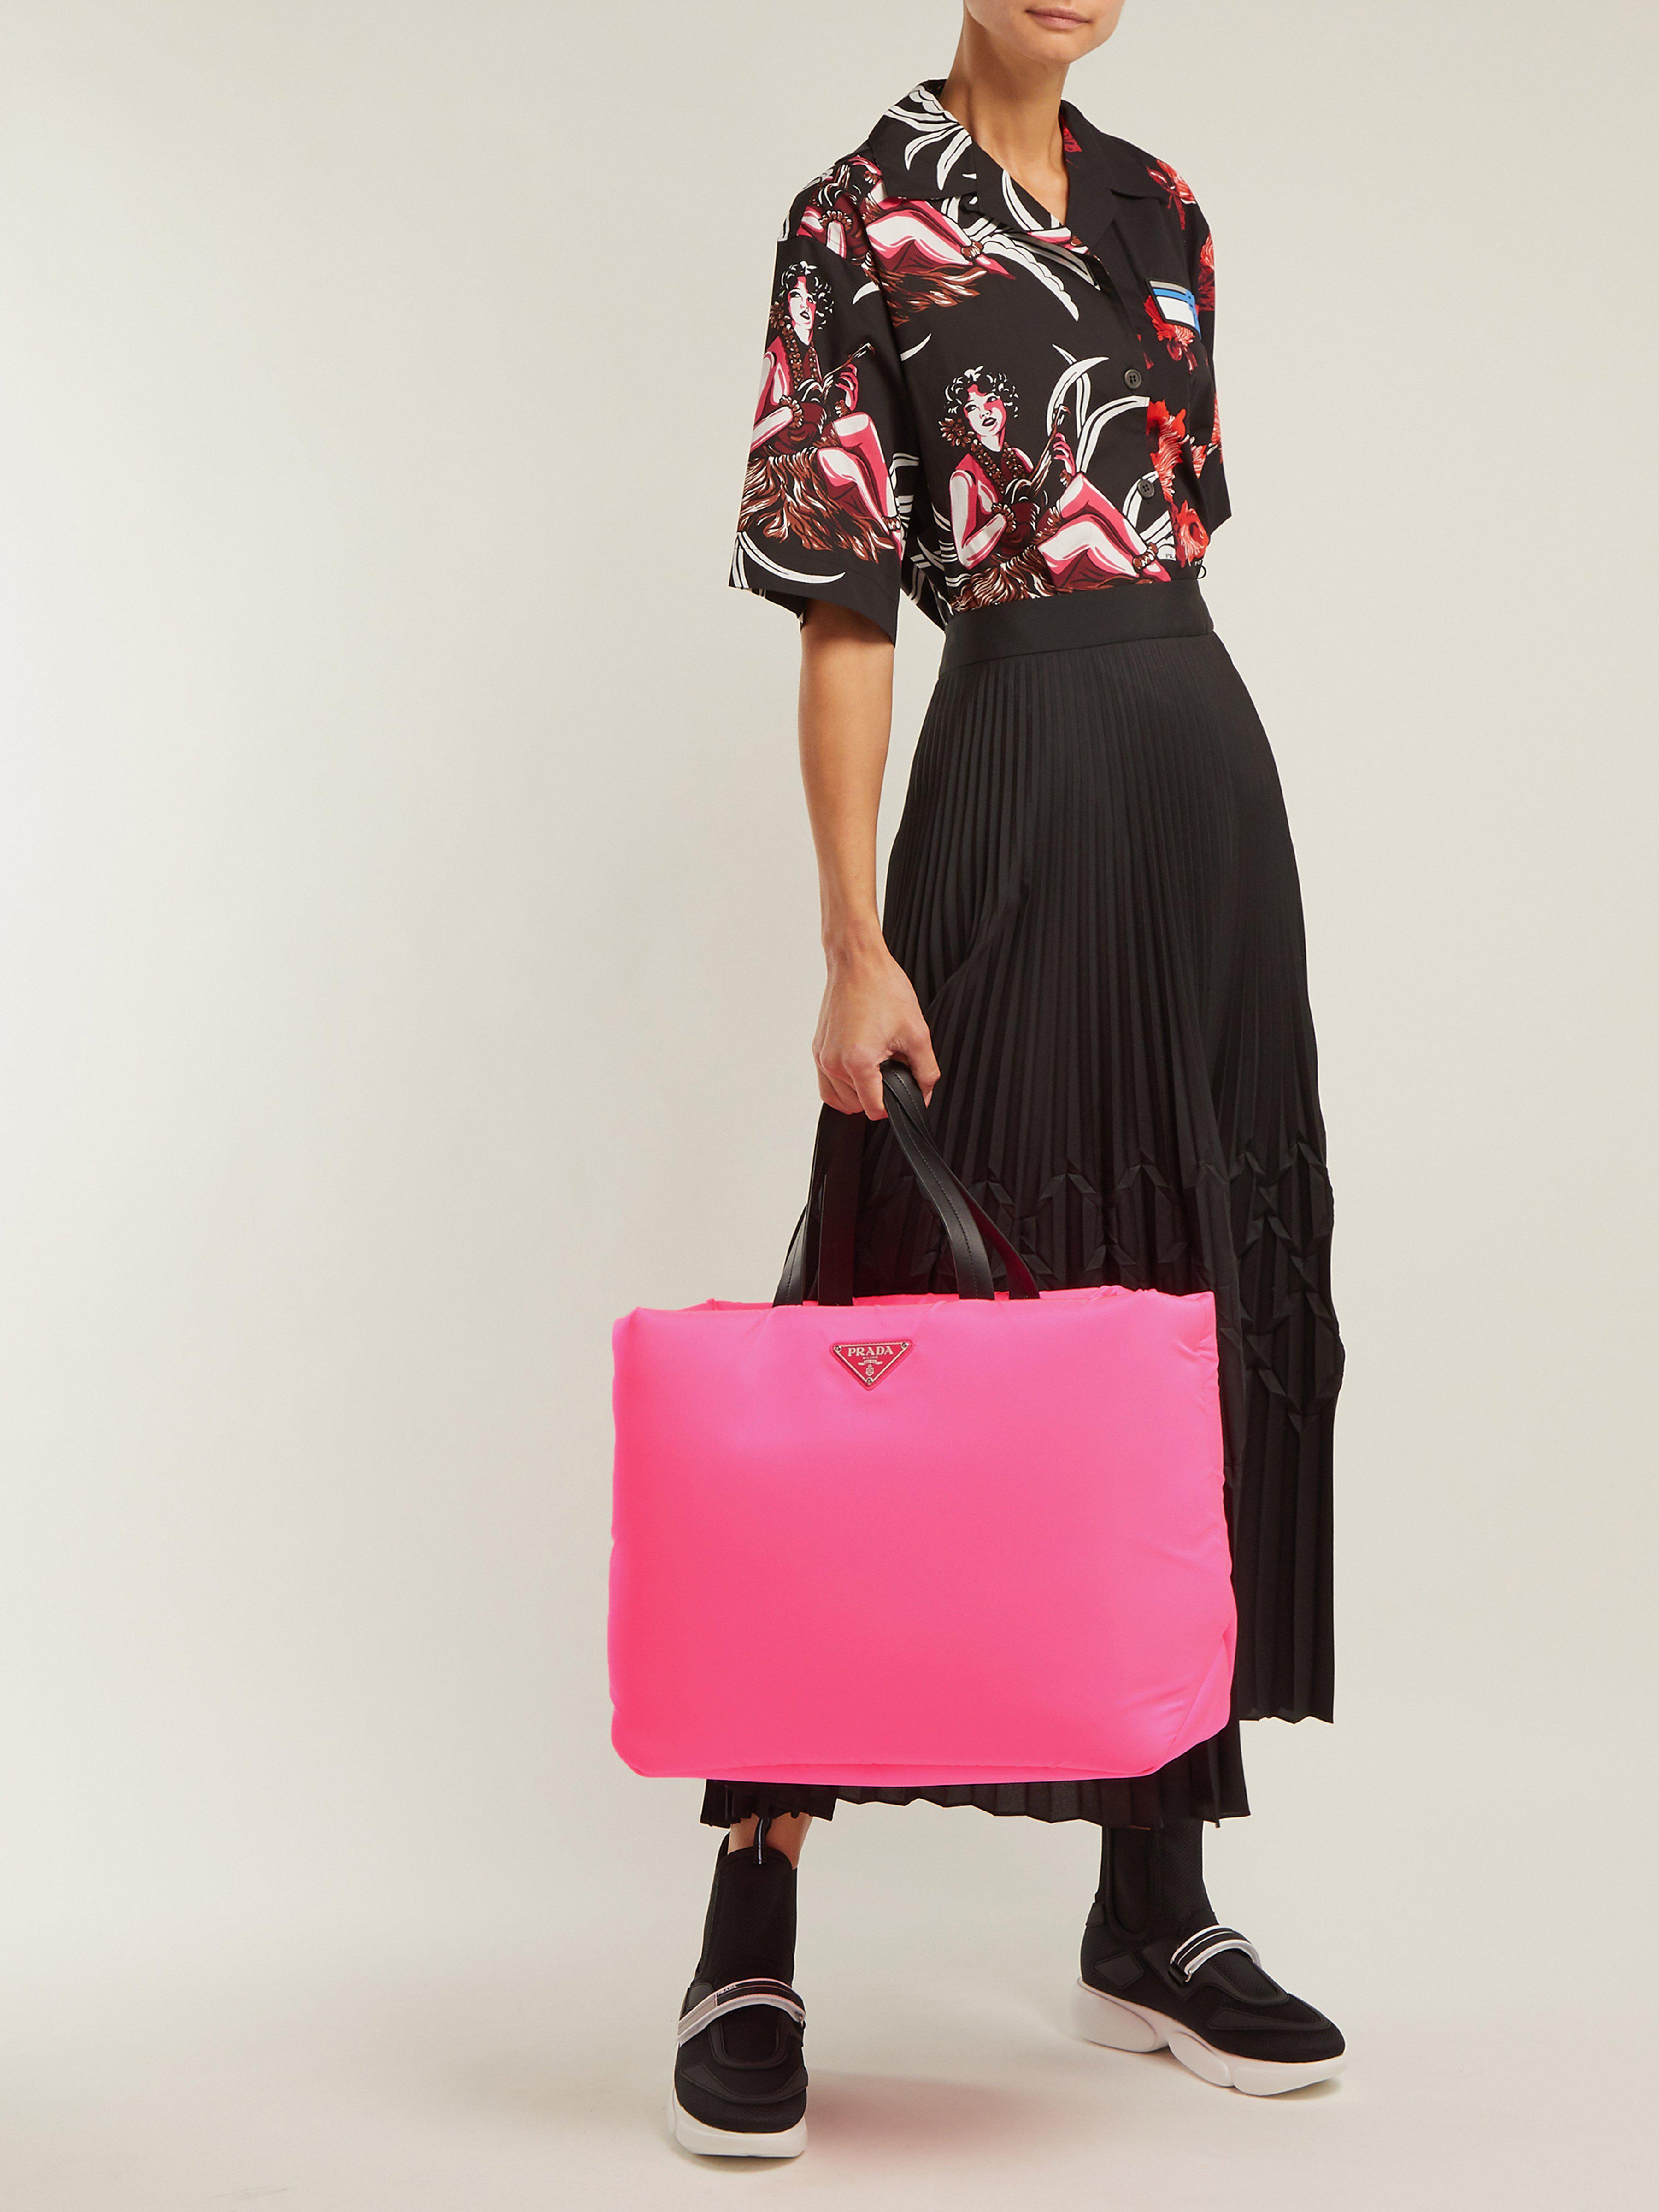 cd90c38377de Prada Logo Embellished Padded Nylon Tote Bag in Pink - Lyst